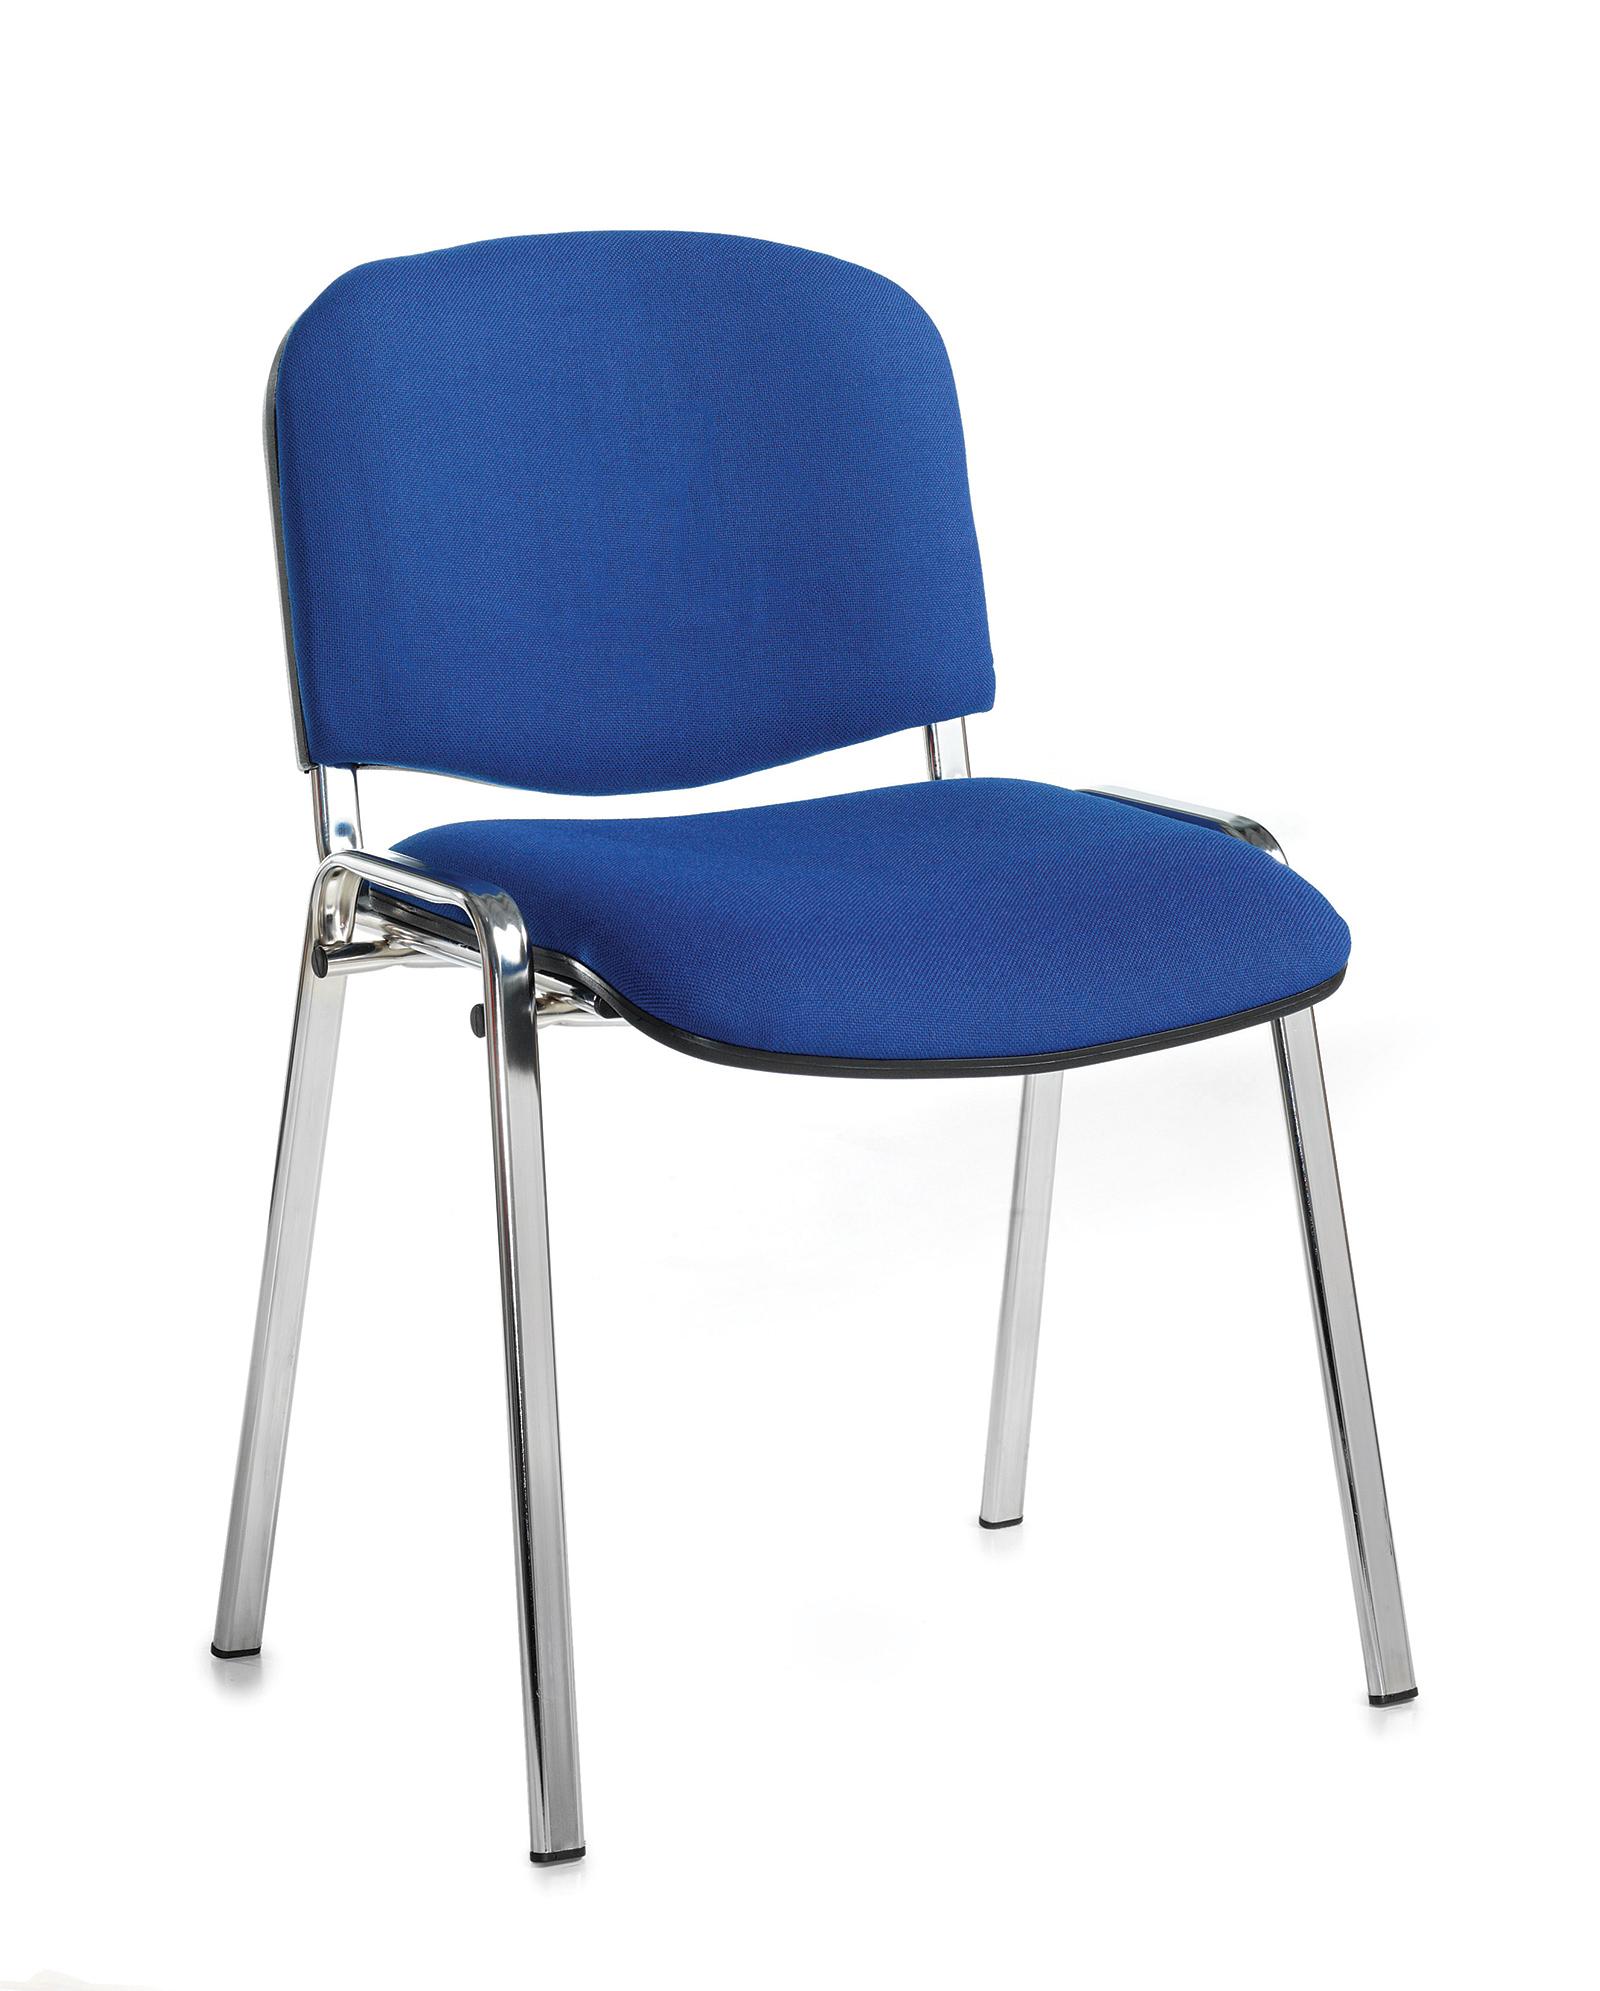 Taurus meeting room chair with chrome frame